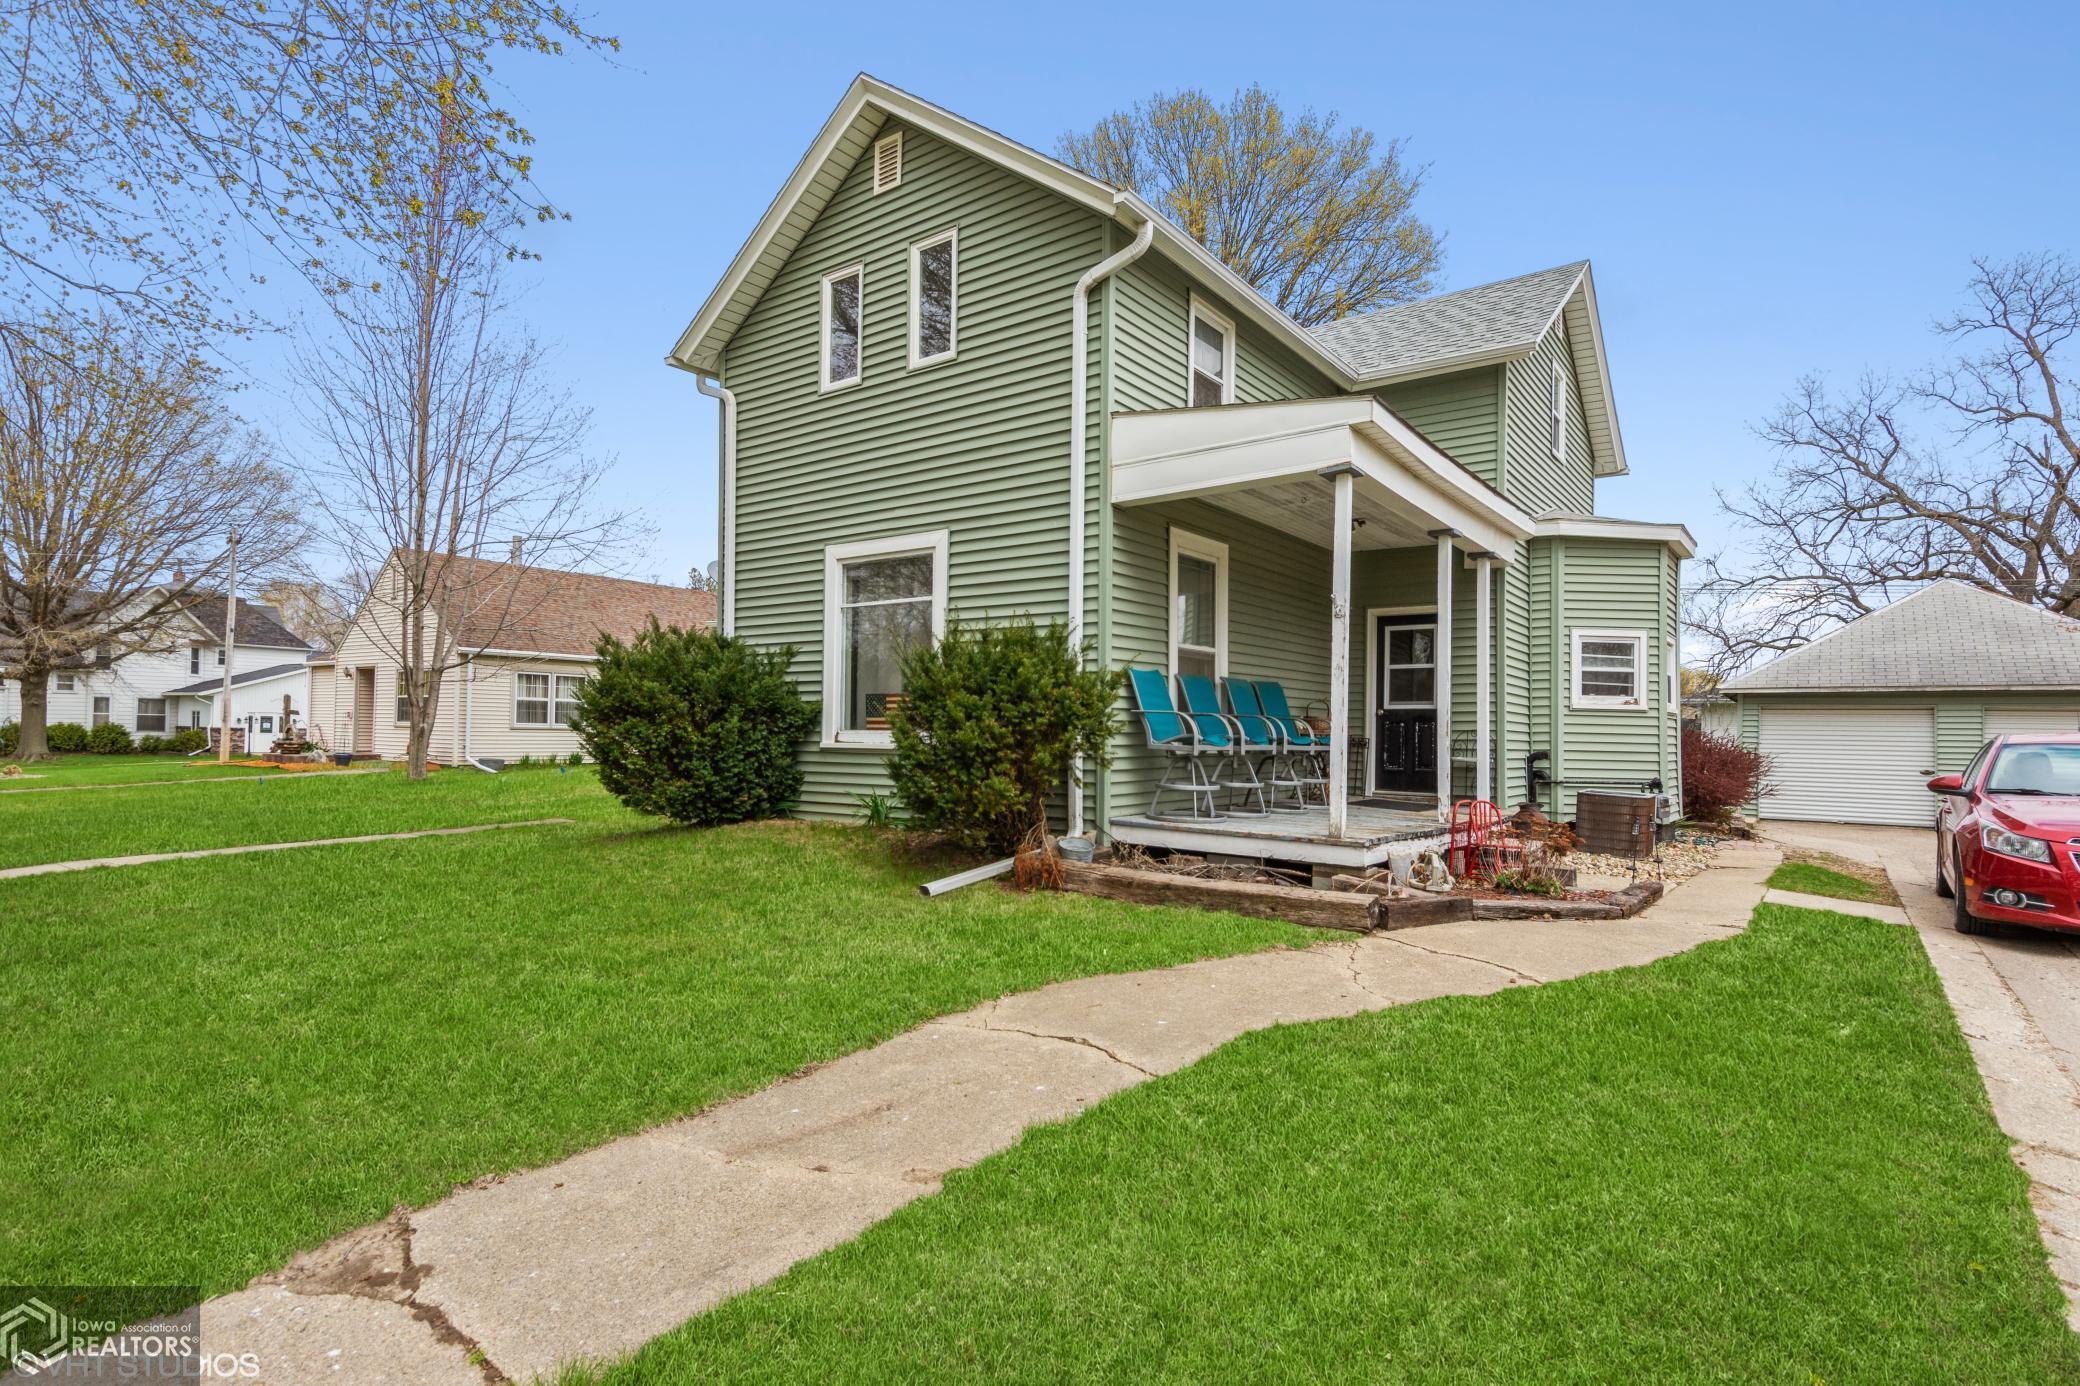 511 Jackson, Brooklyn, Iowa 52211-9778, 4 Bedrooms Bedrooms, ,1 BathroomBathrooms,Single Family,For Sale,Jackson,5741960